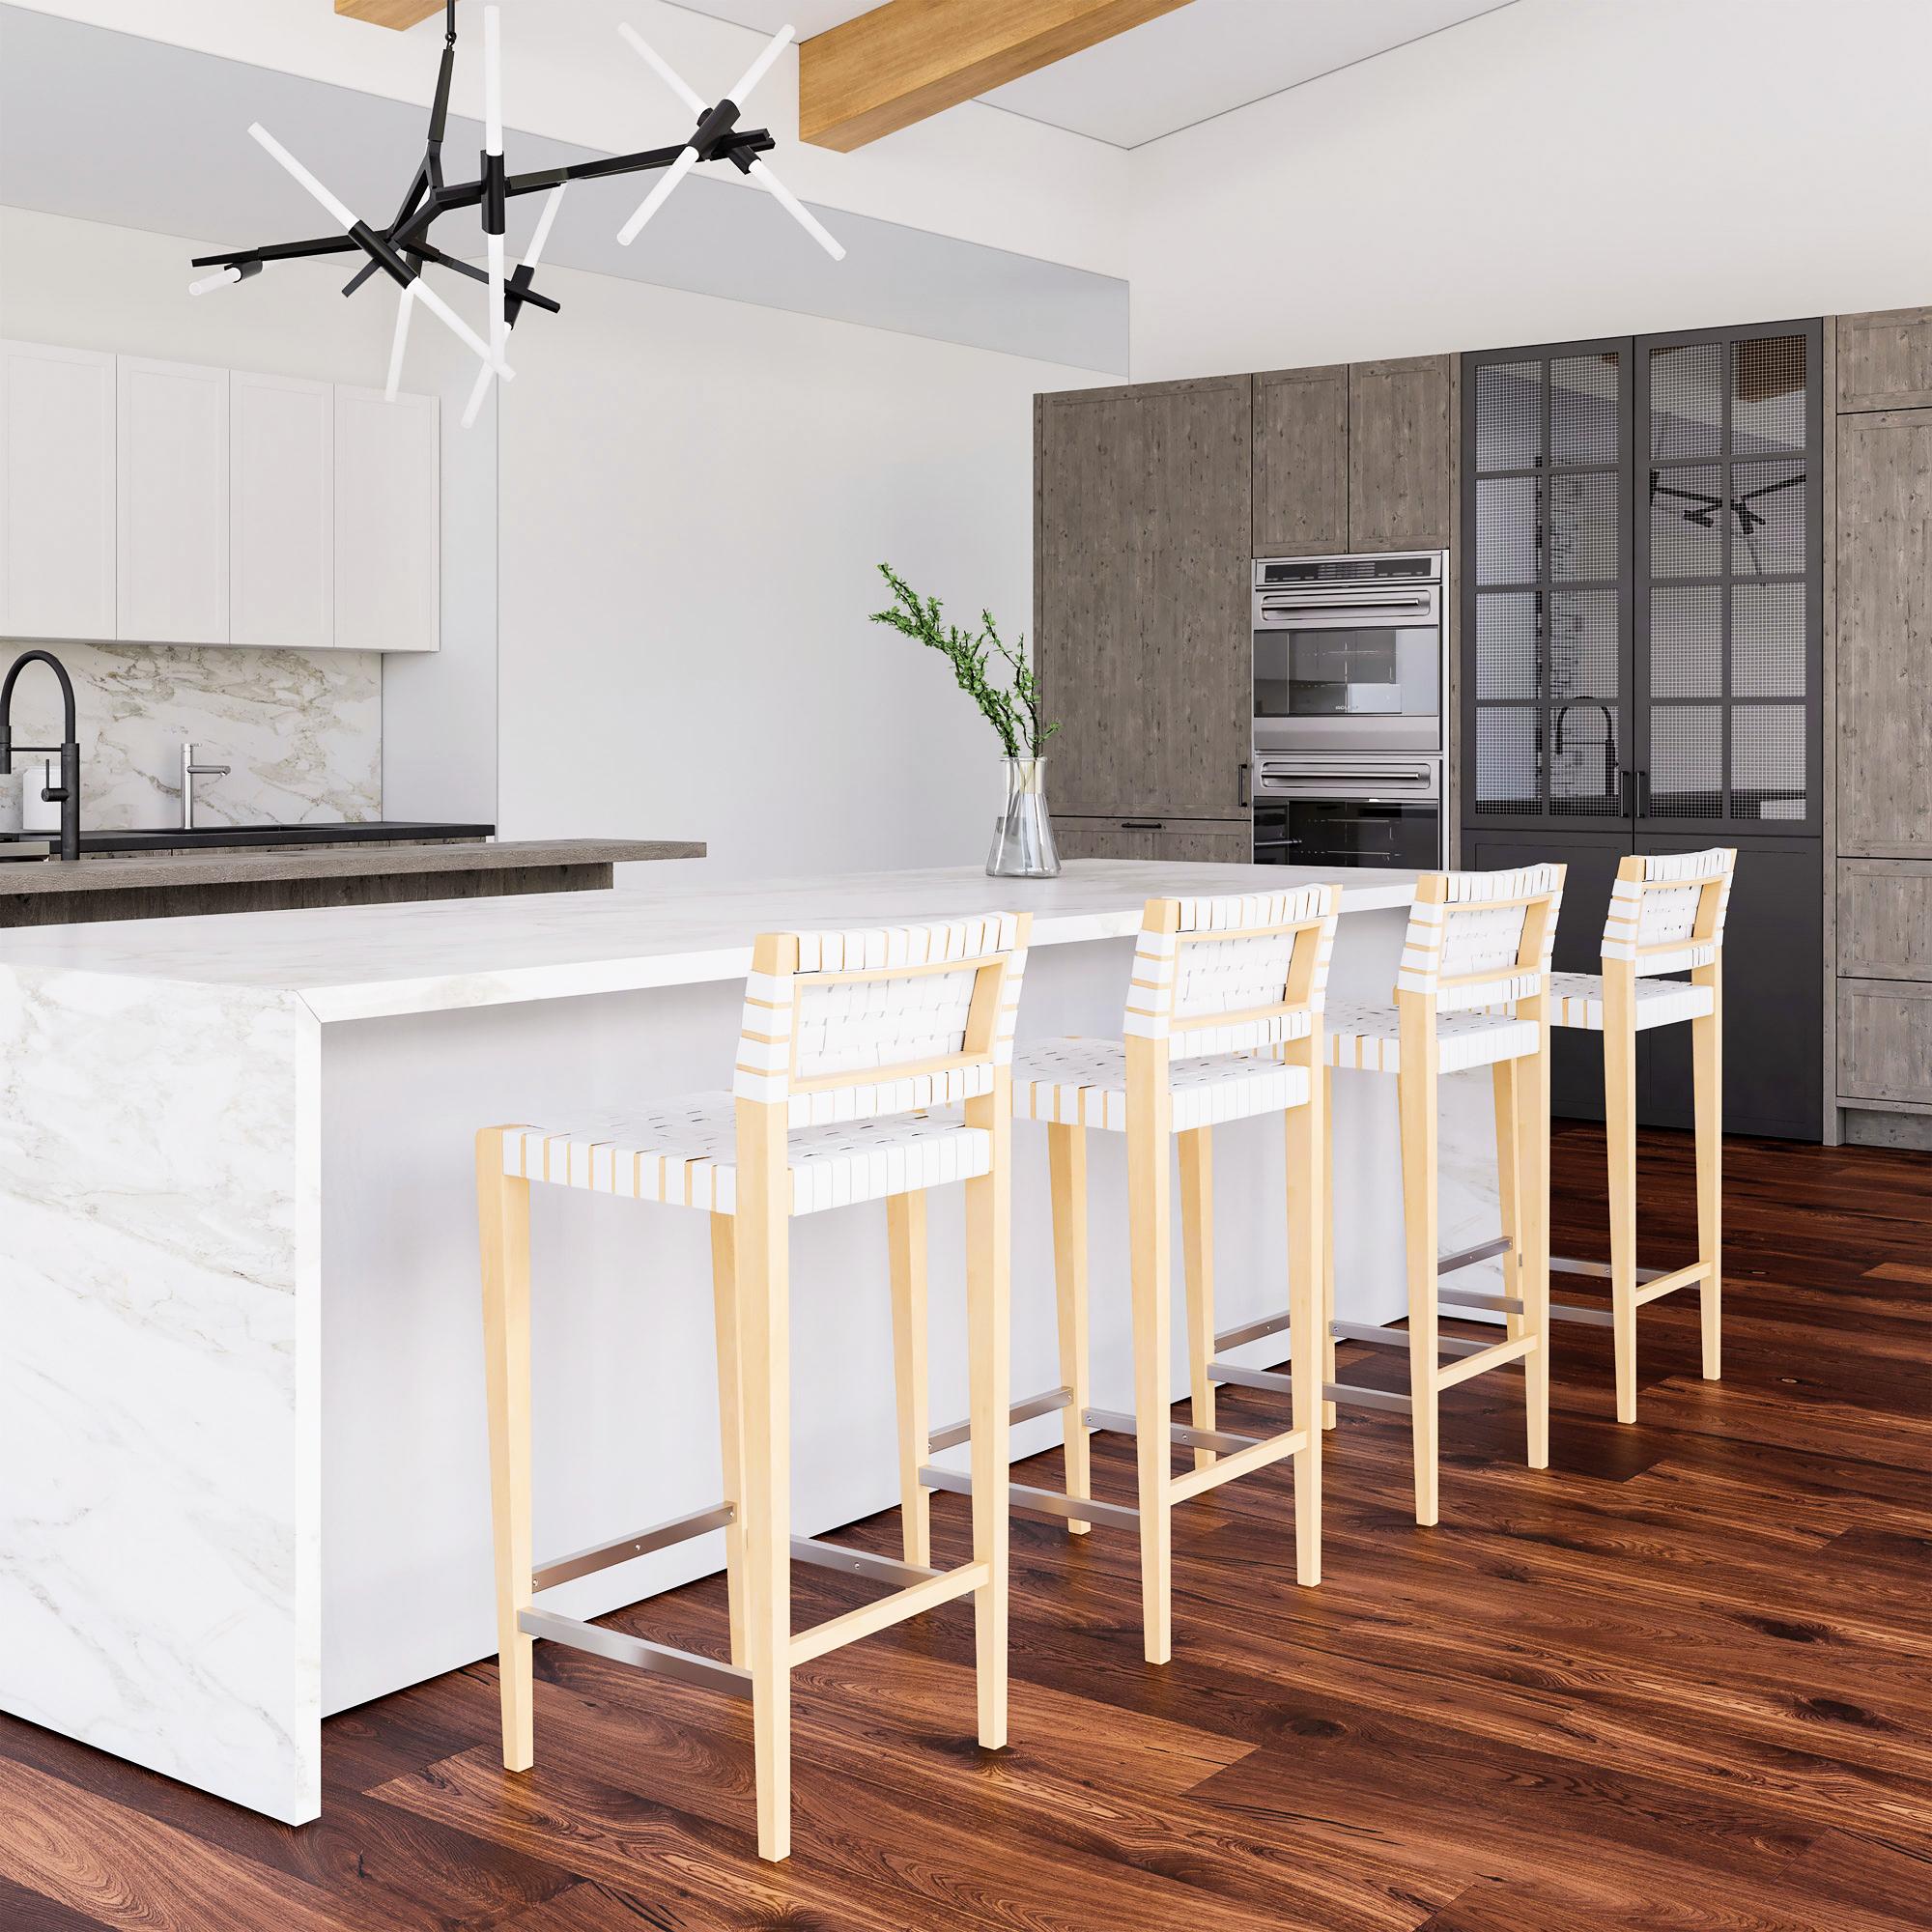 Risom Counter Stool Counter Stools Interior Design Kitchen Kitchen Remodel